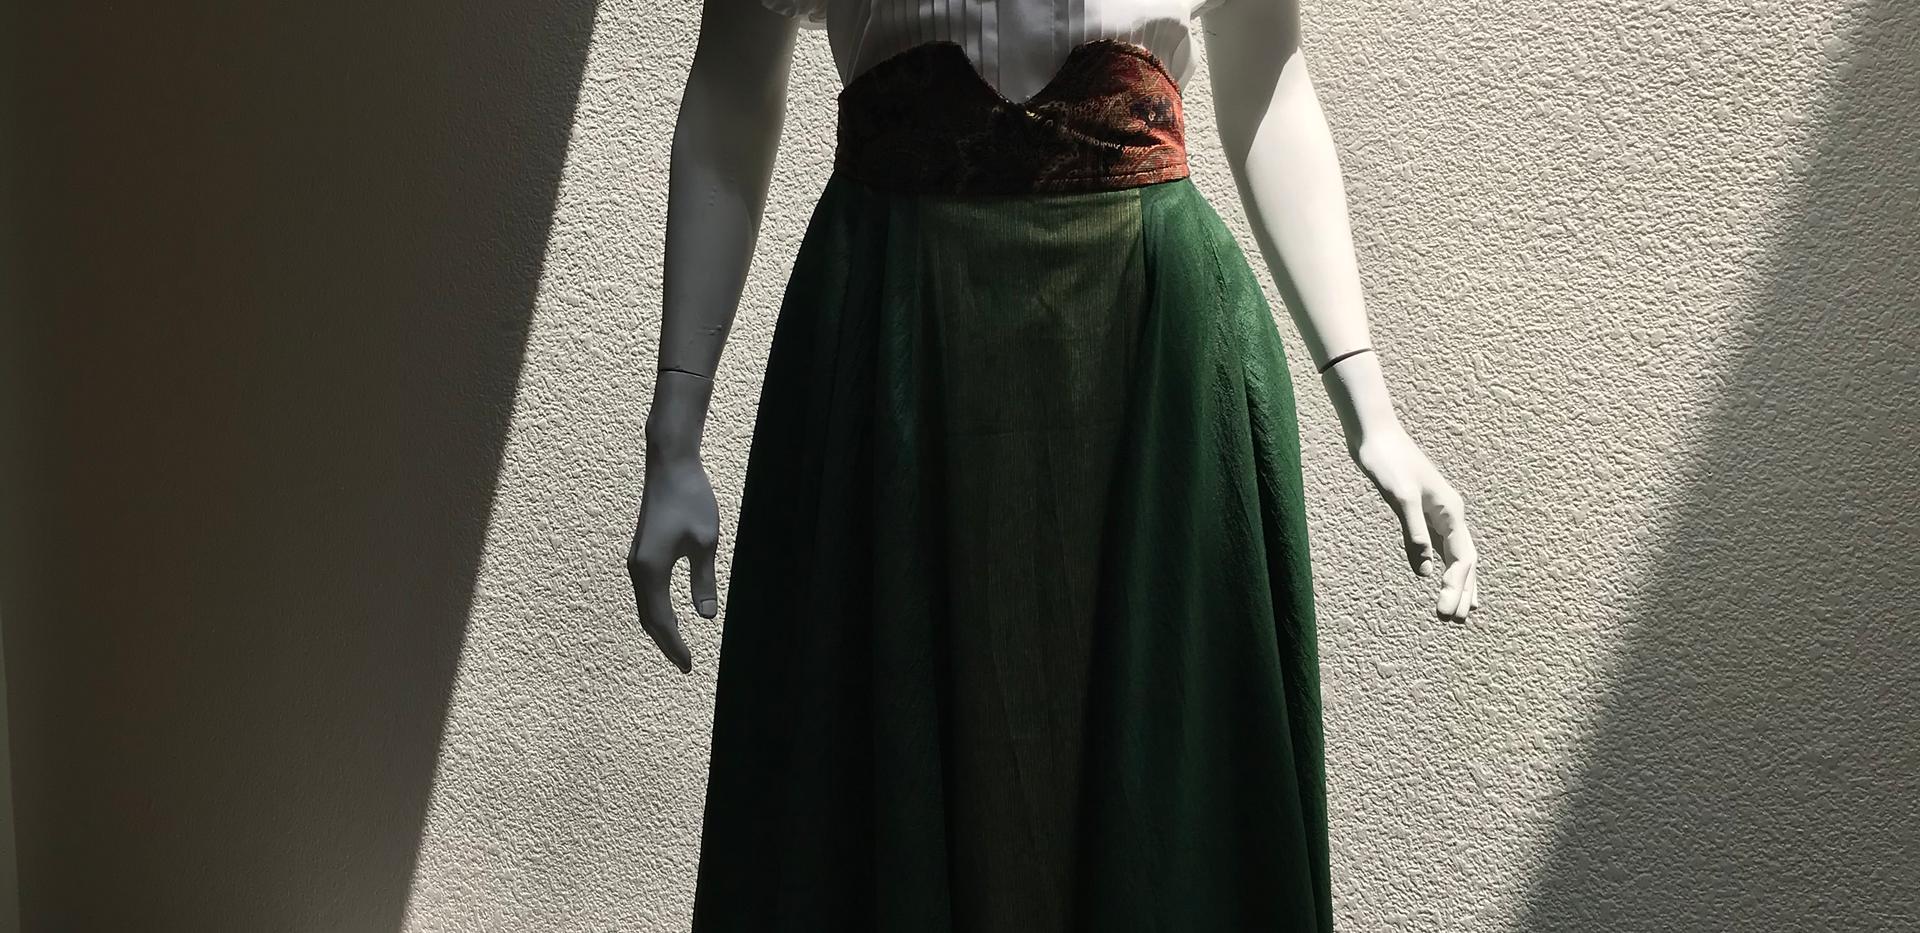 The Kathryn Running Late Skirt